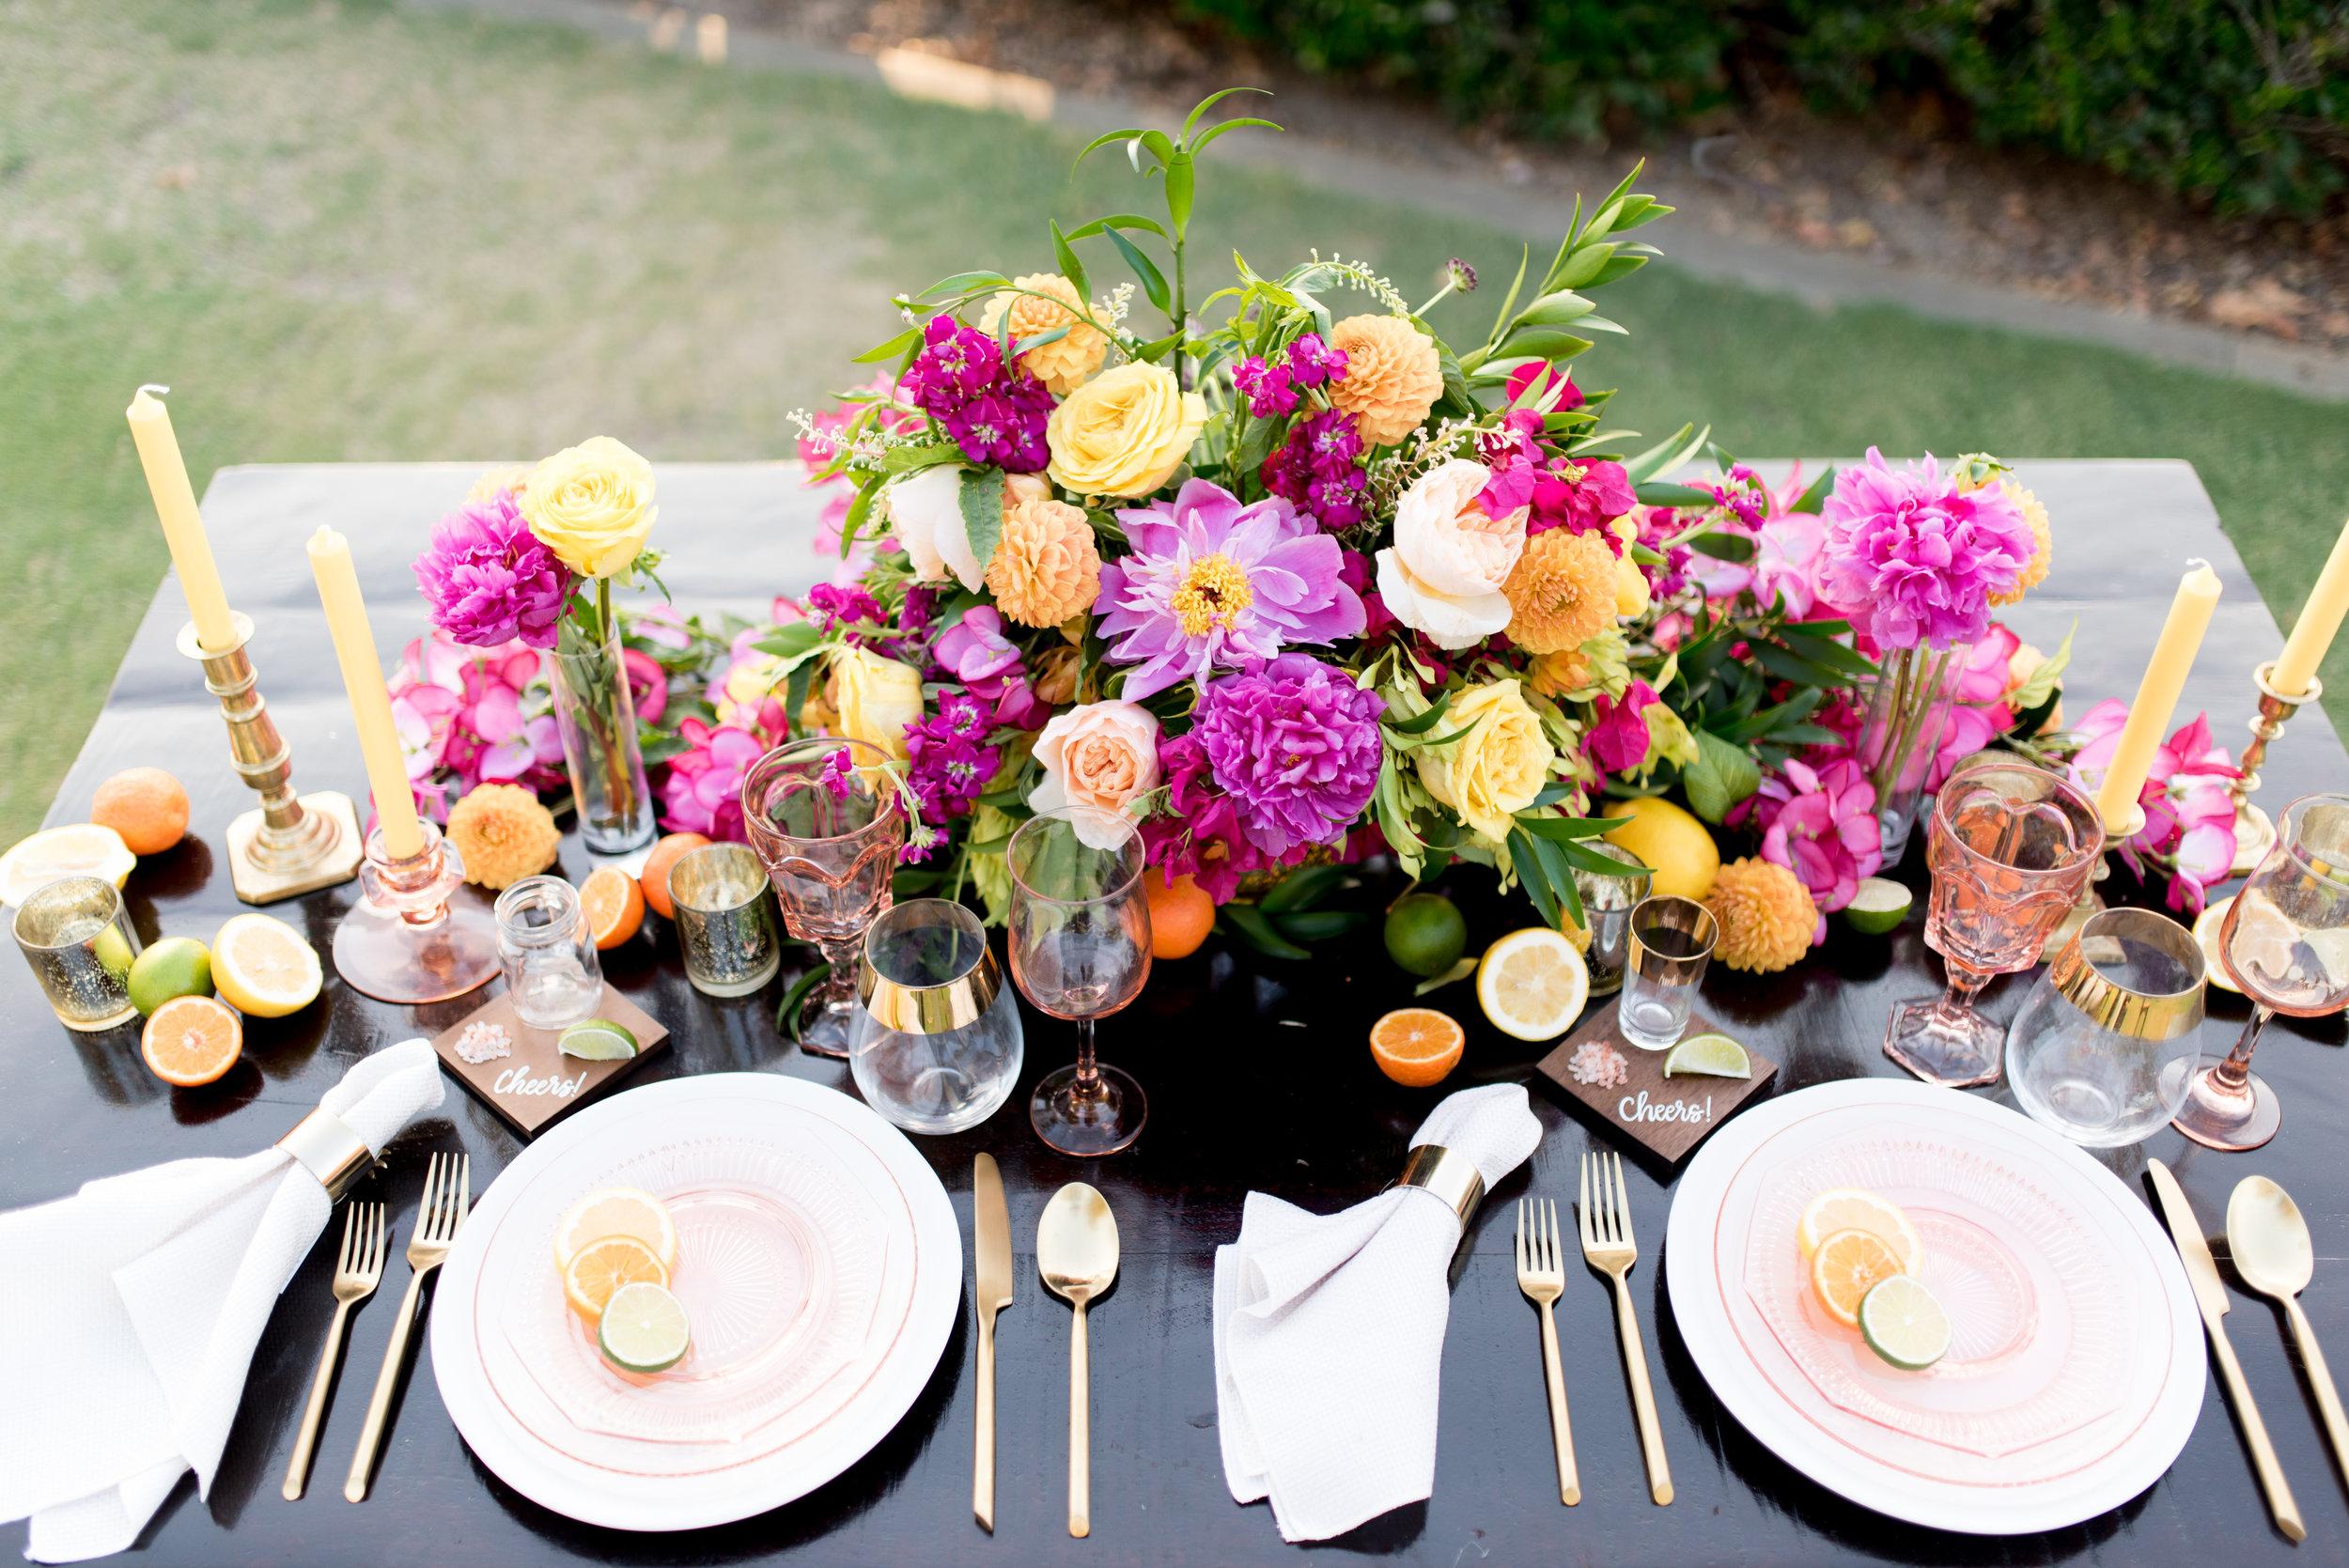 orange county wedding colorful table design